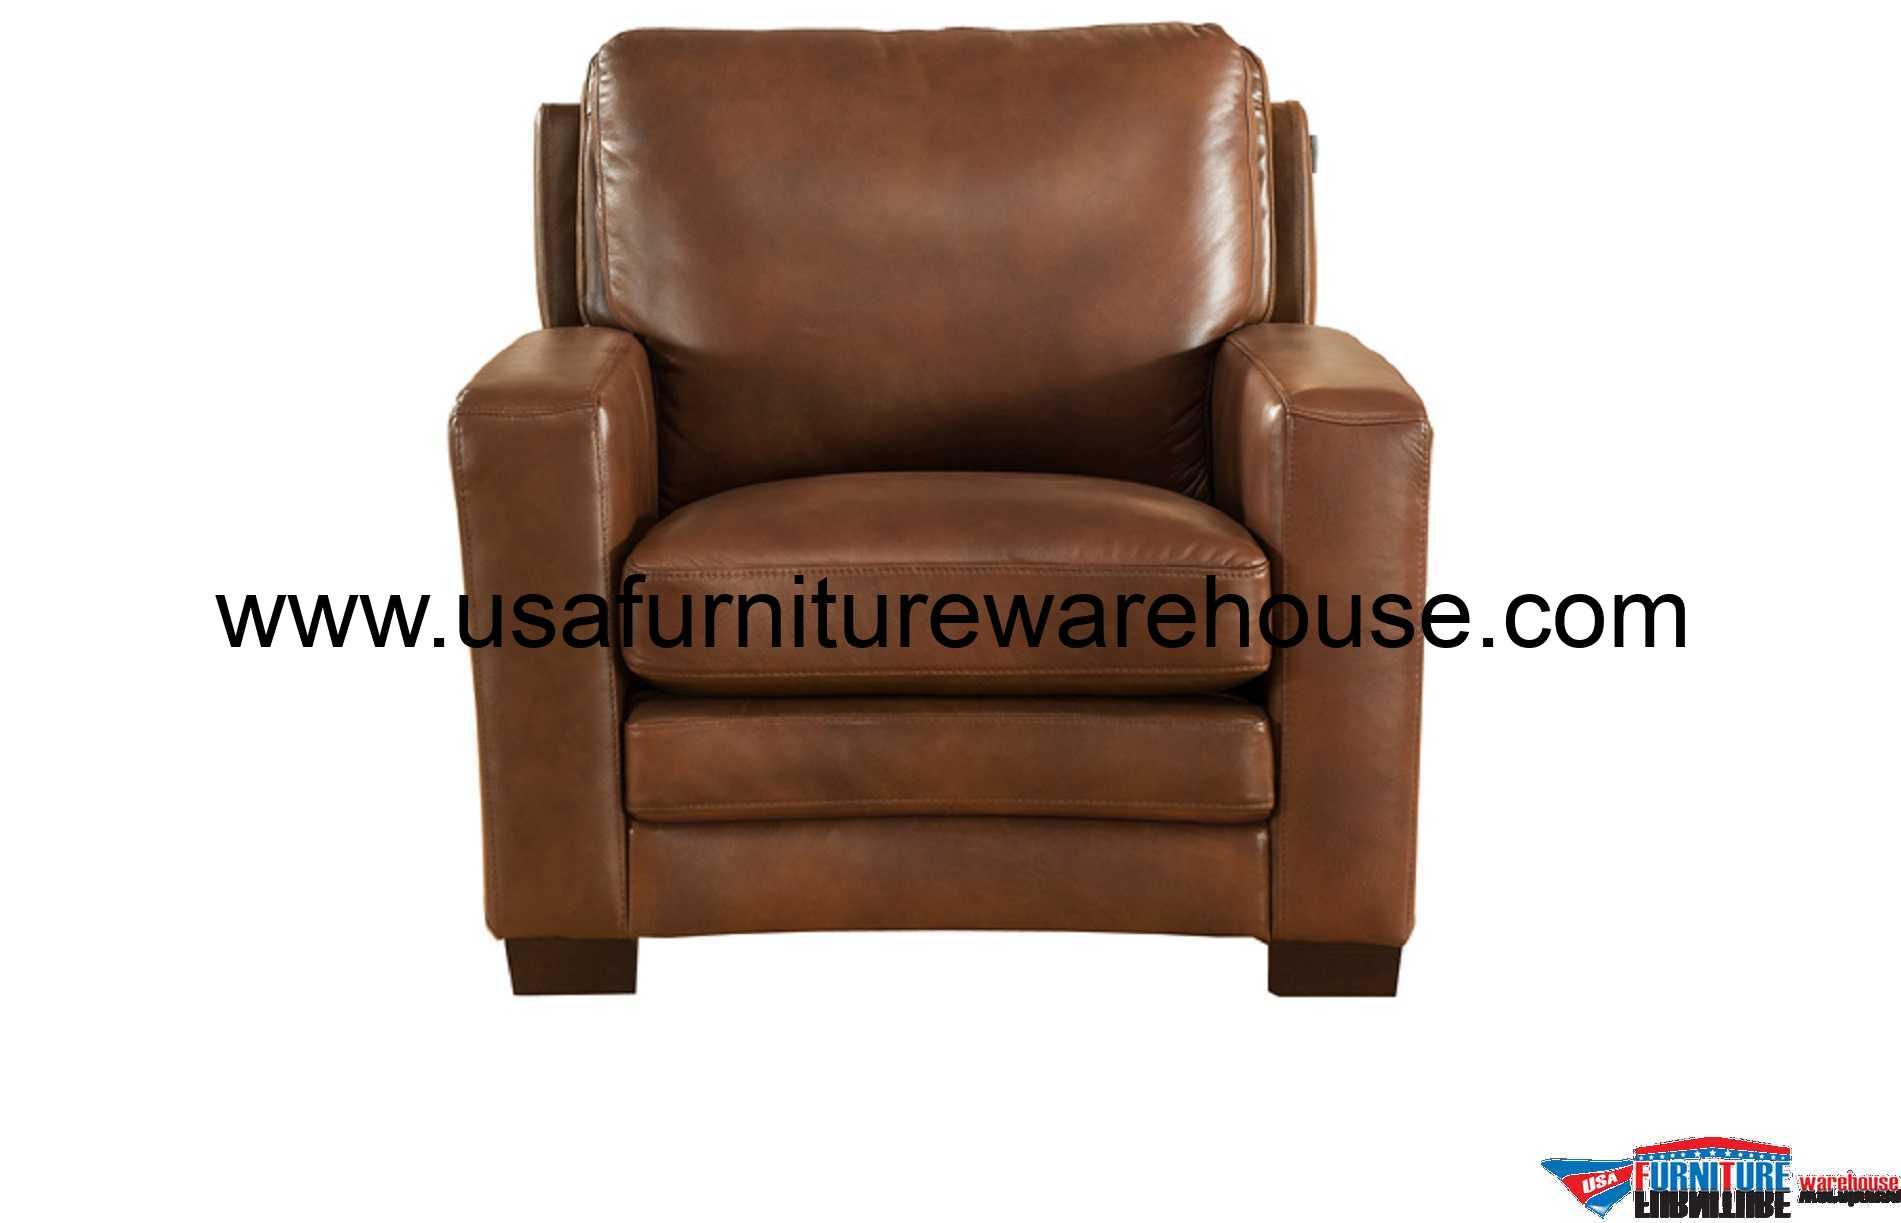 Joanna Full Top Grain Brown Leather Chair  USA Furniture